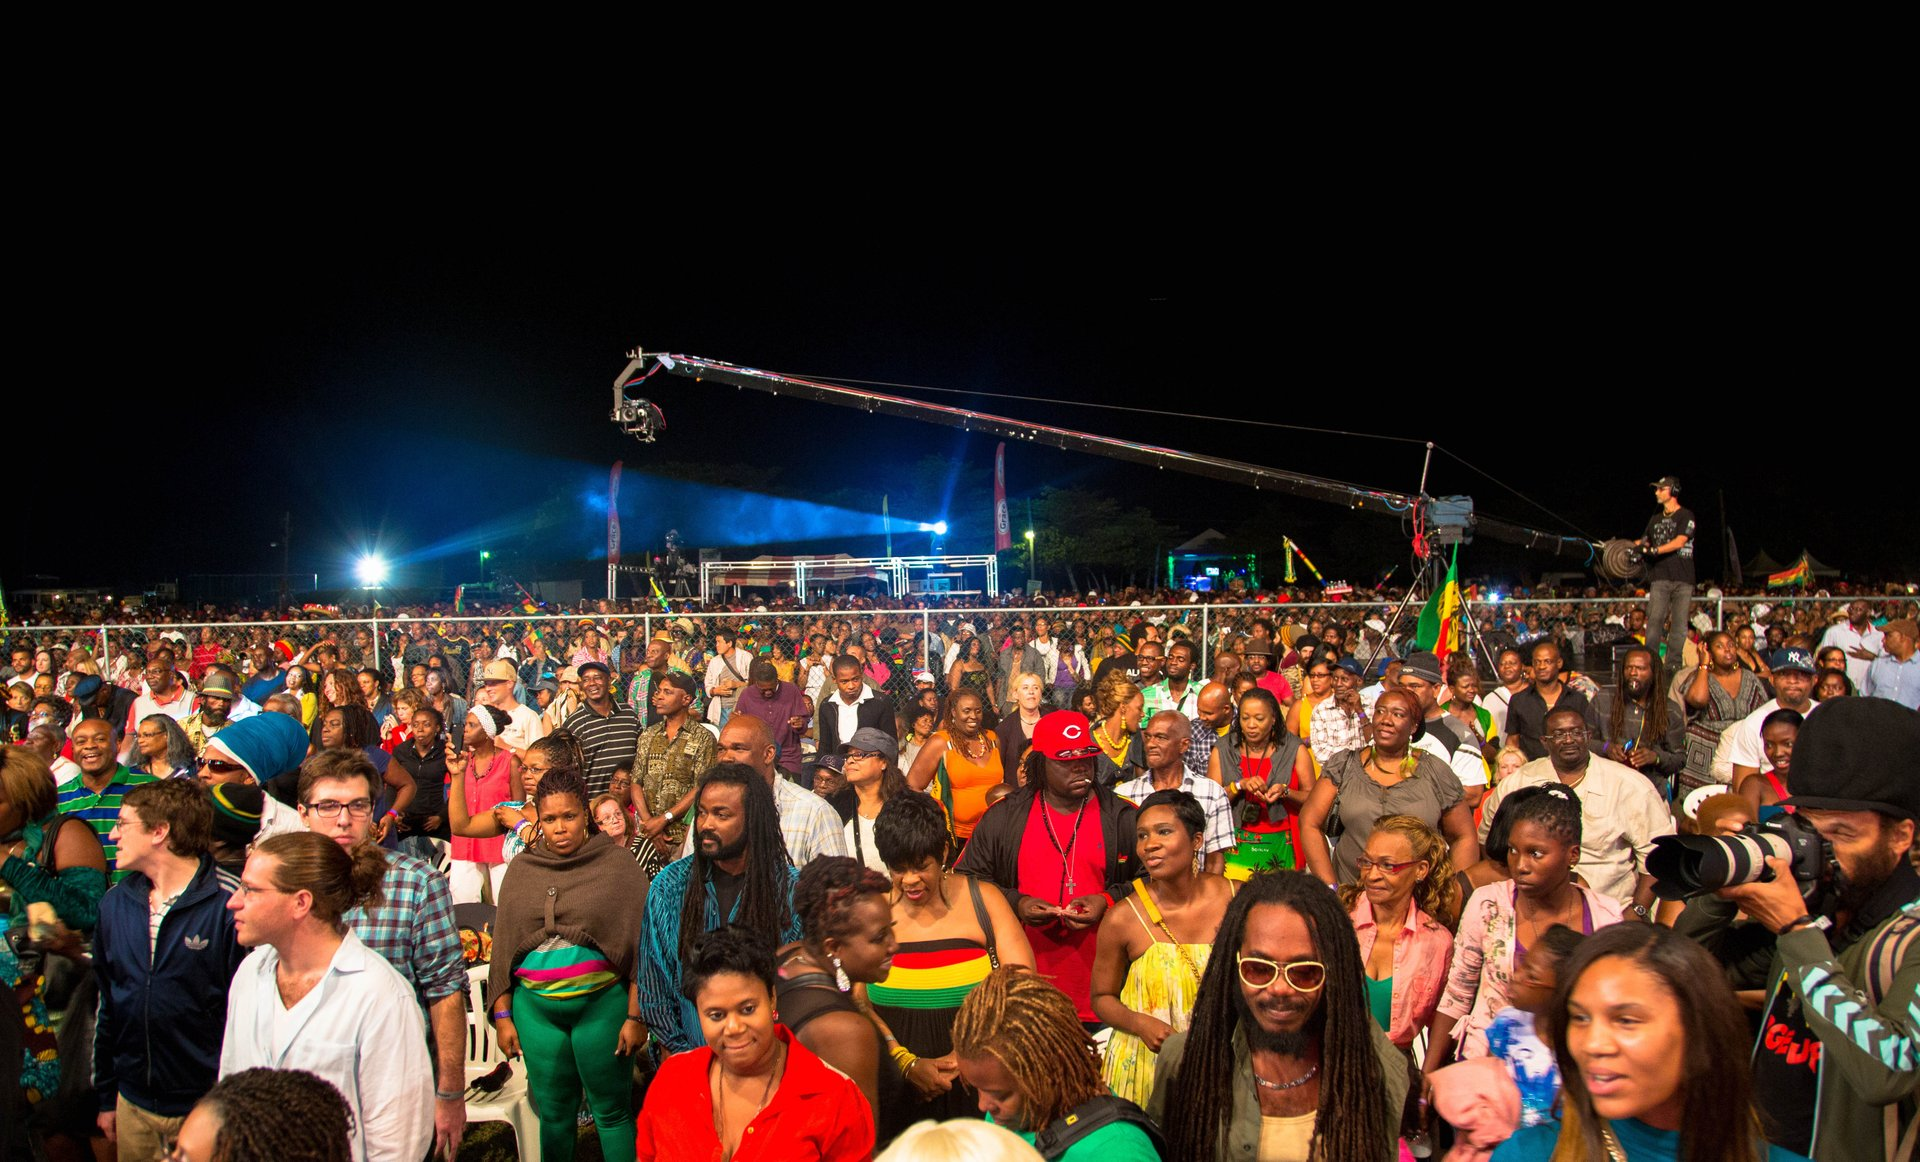 Rebel Salute in Jamaica 2020 - Best Time